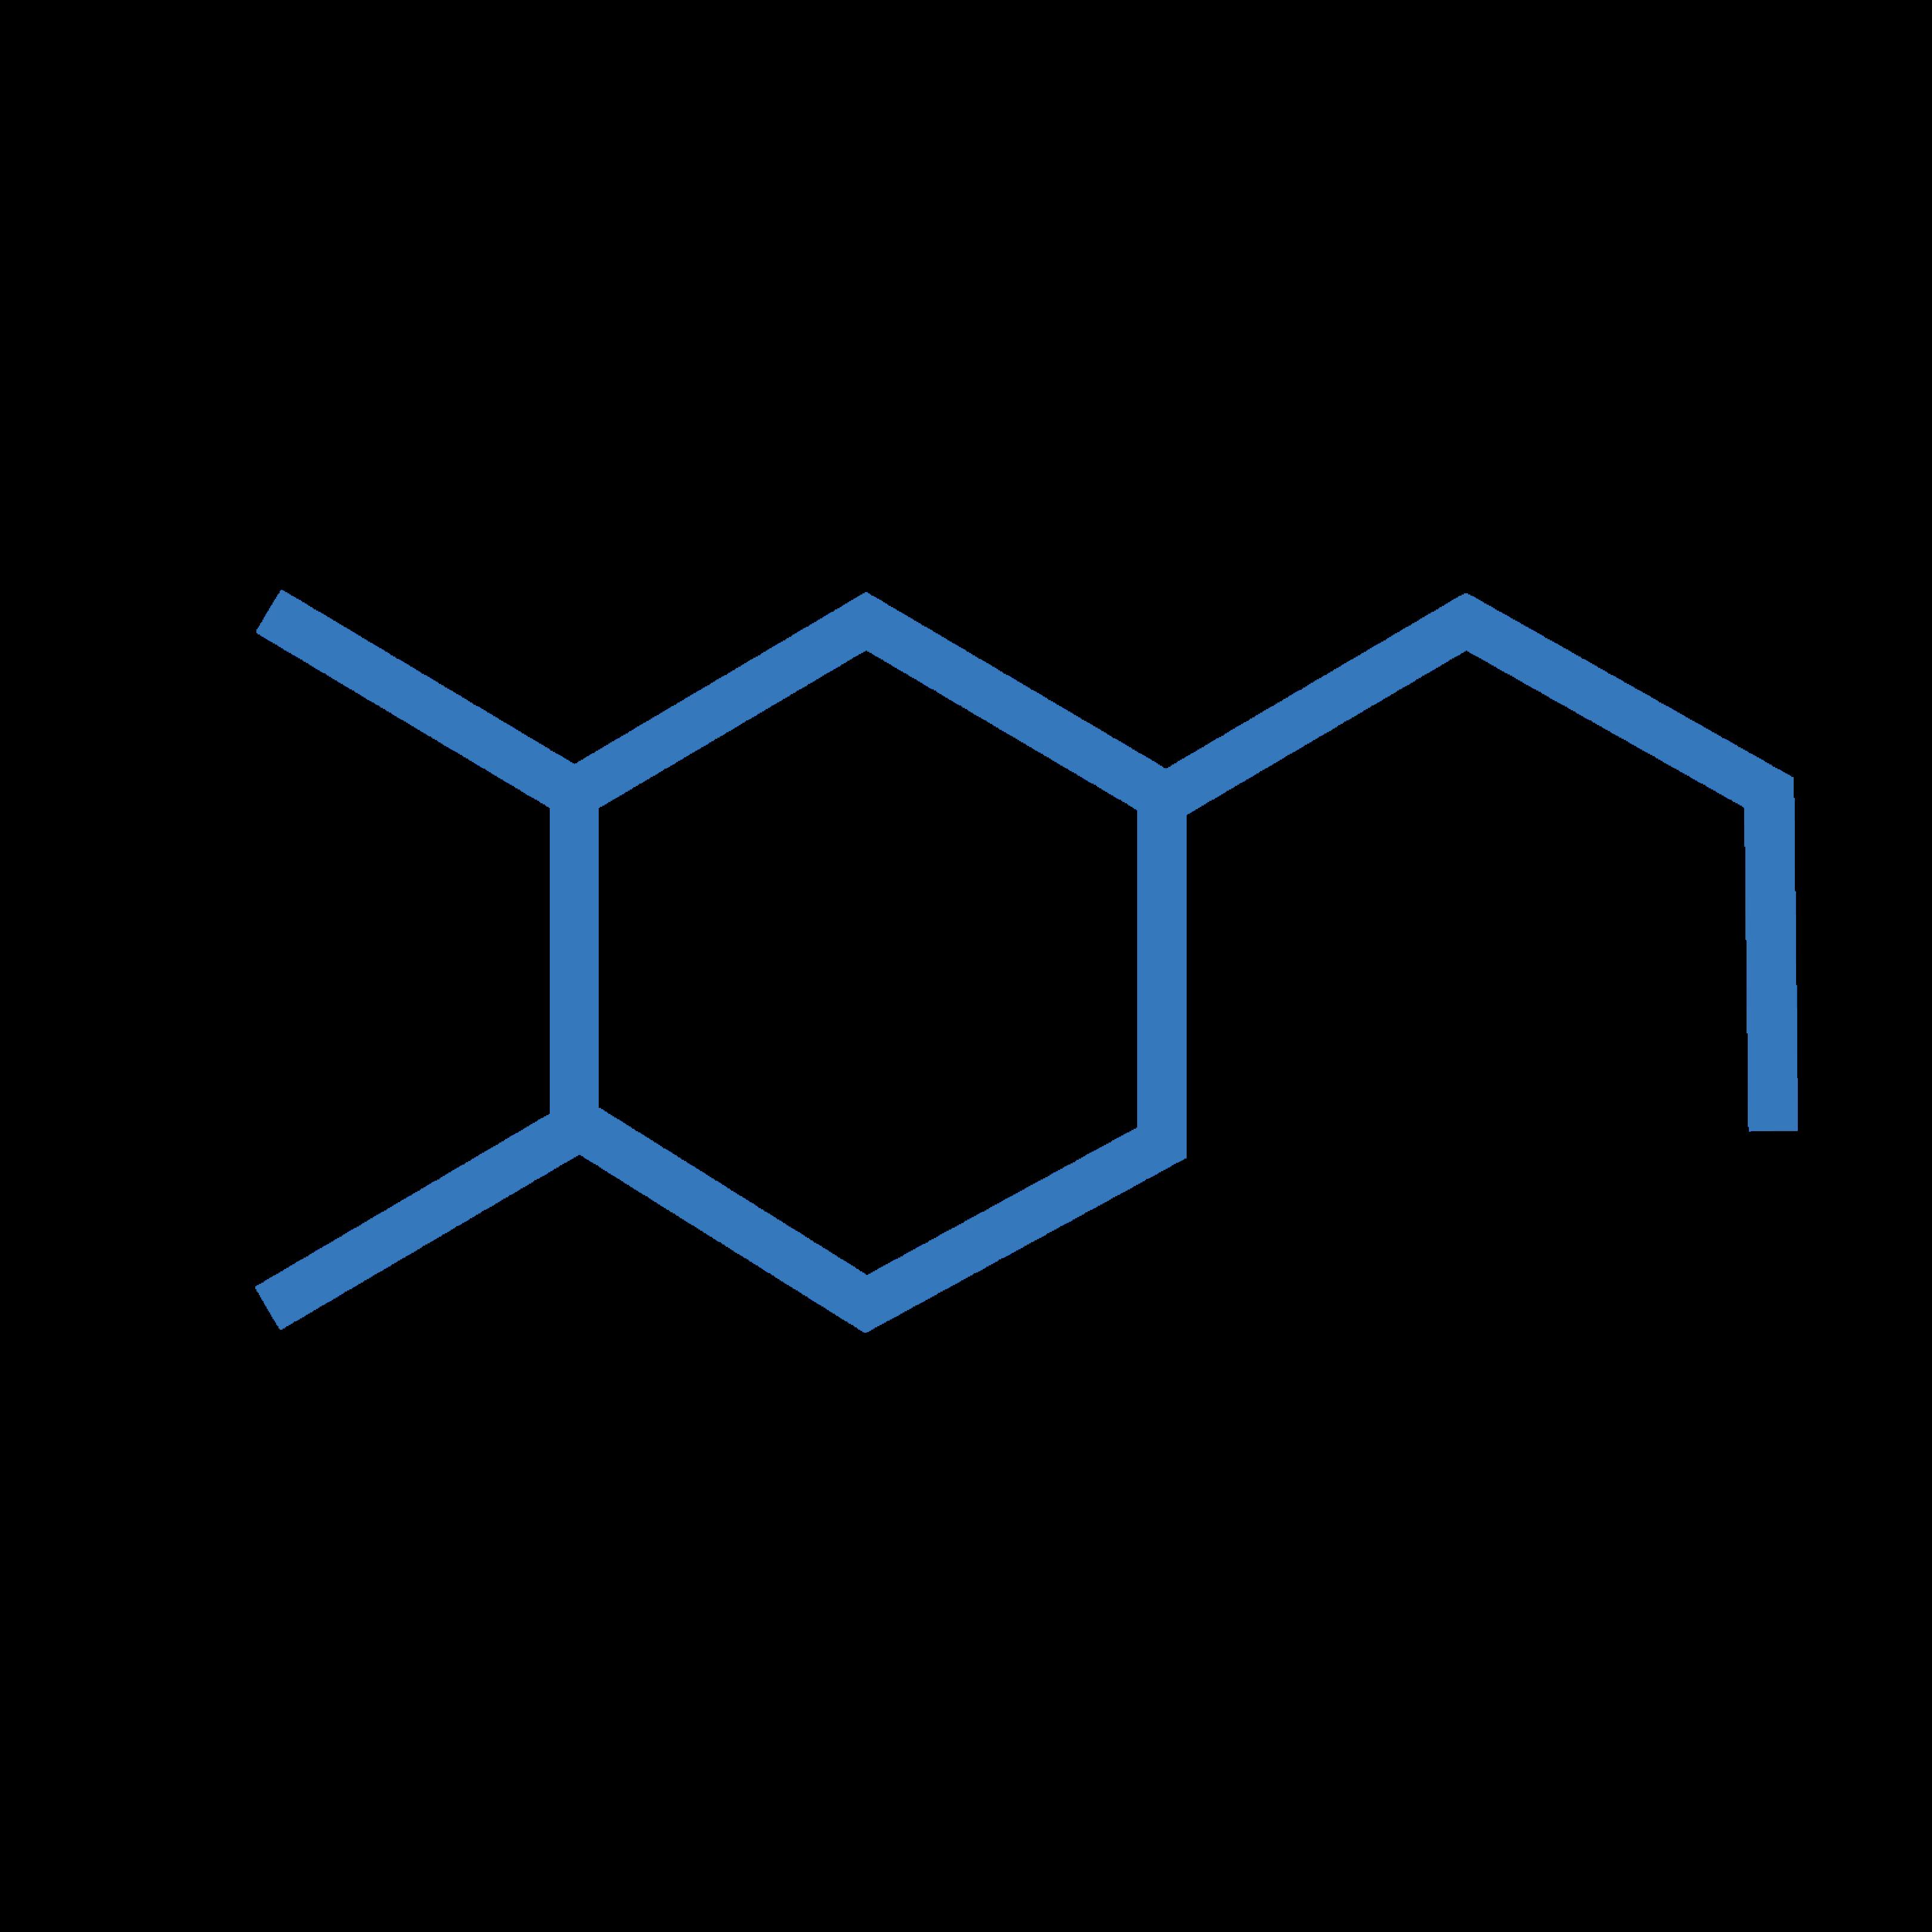 NCM logo png